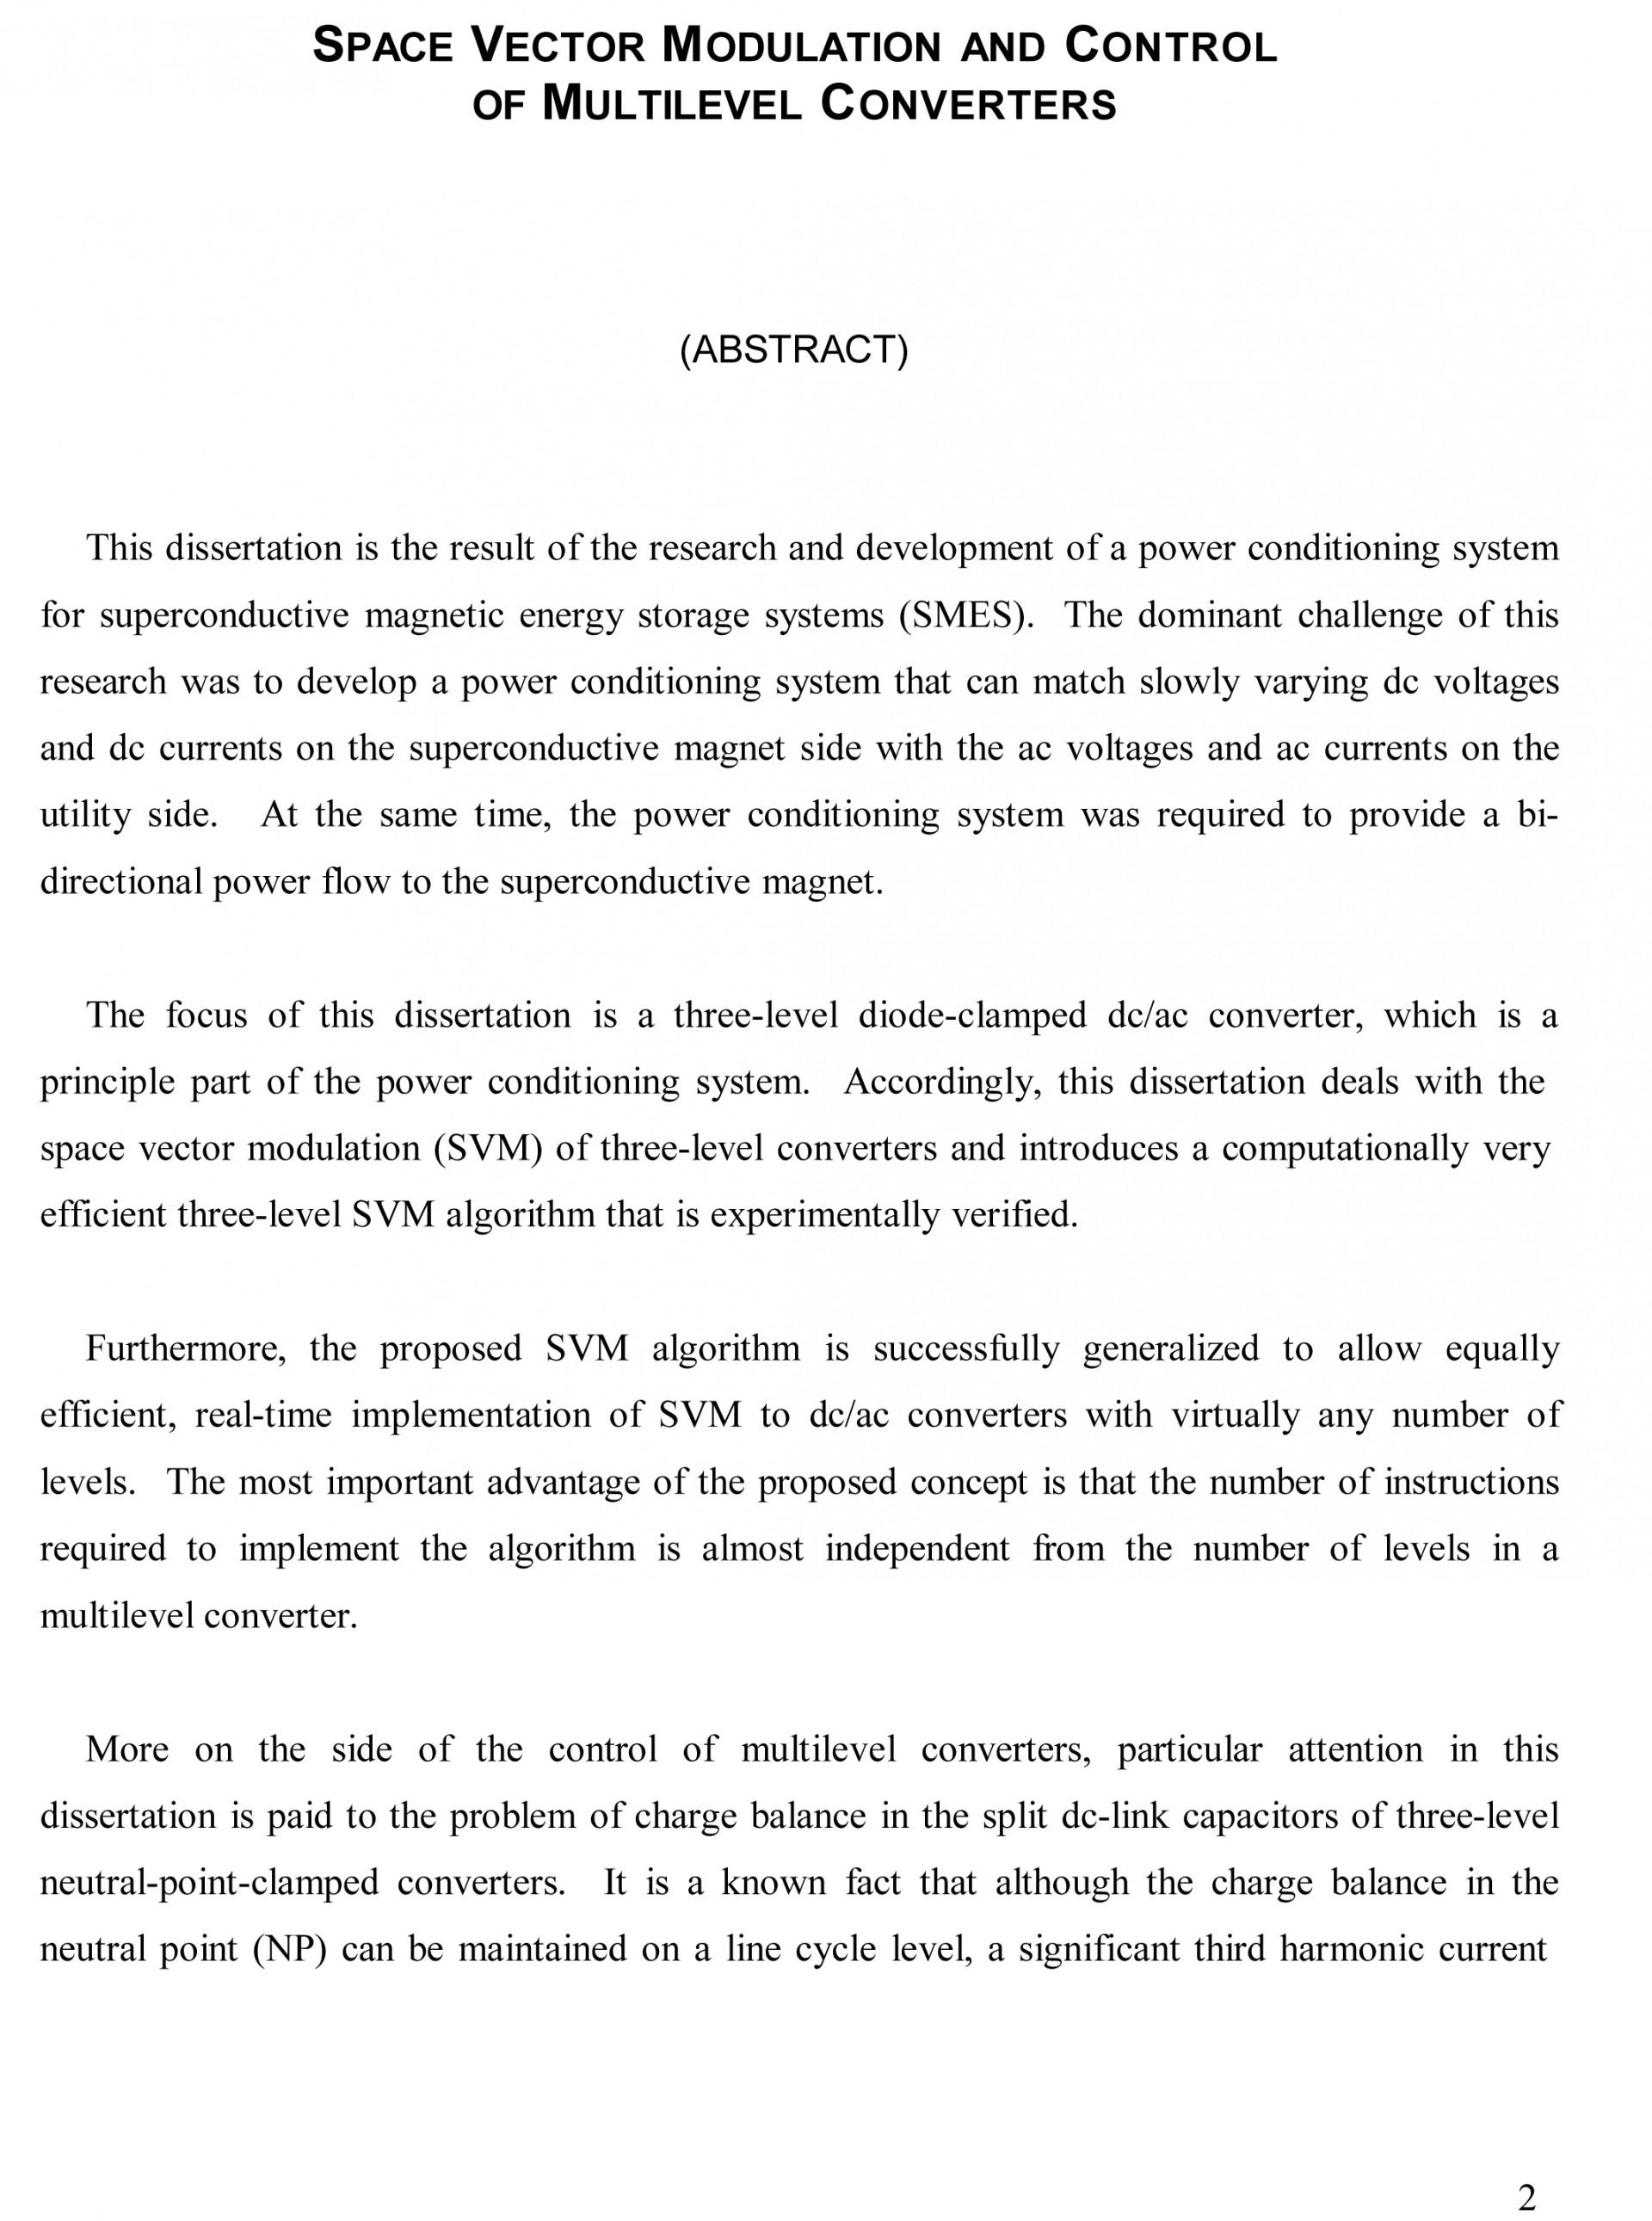 014 Essay Example Mahatma Magnificent Gandhi Conclusion In English 1000 Words Pdf Hindi 5 Lines 1920